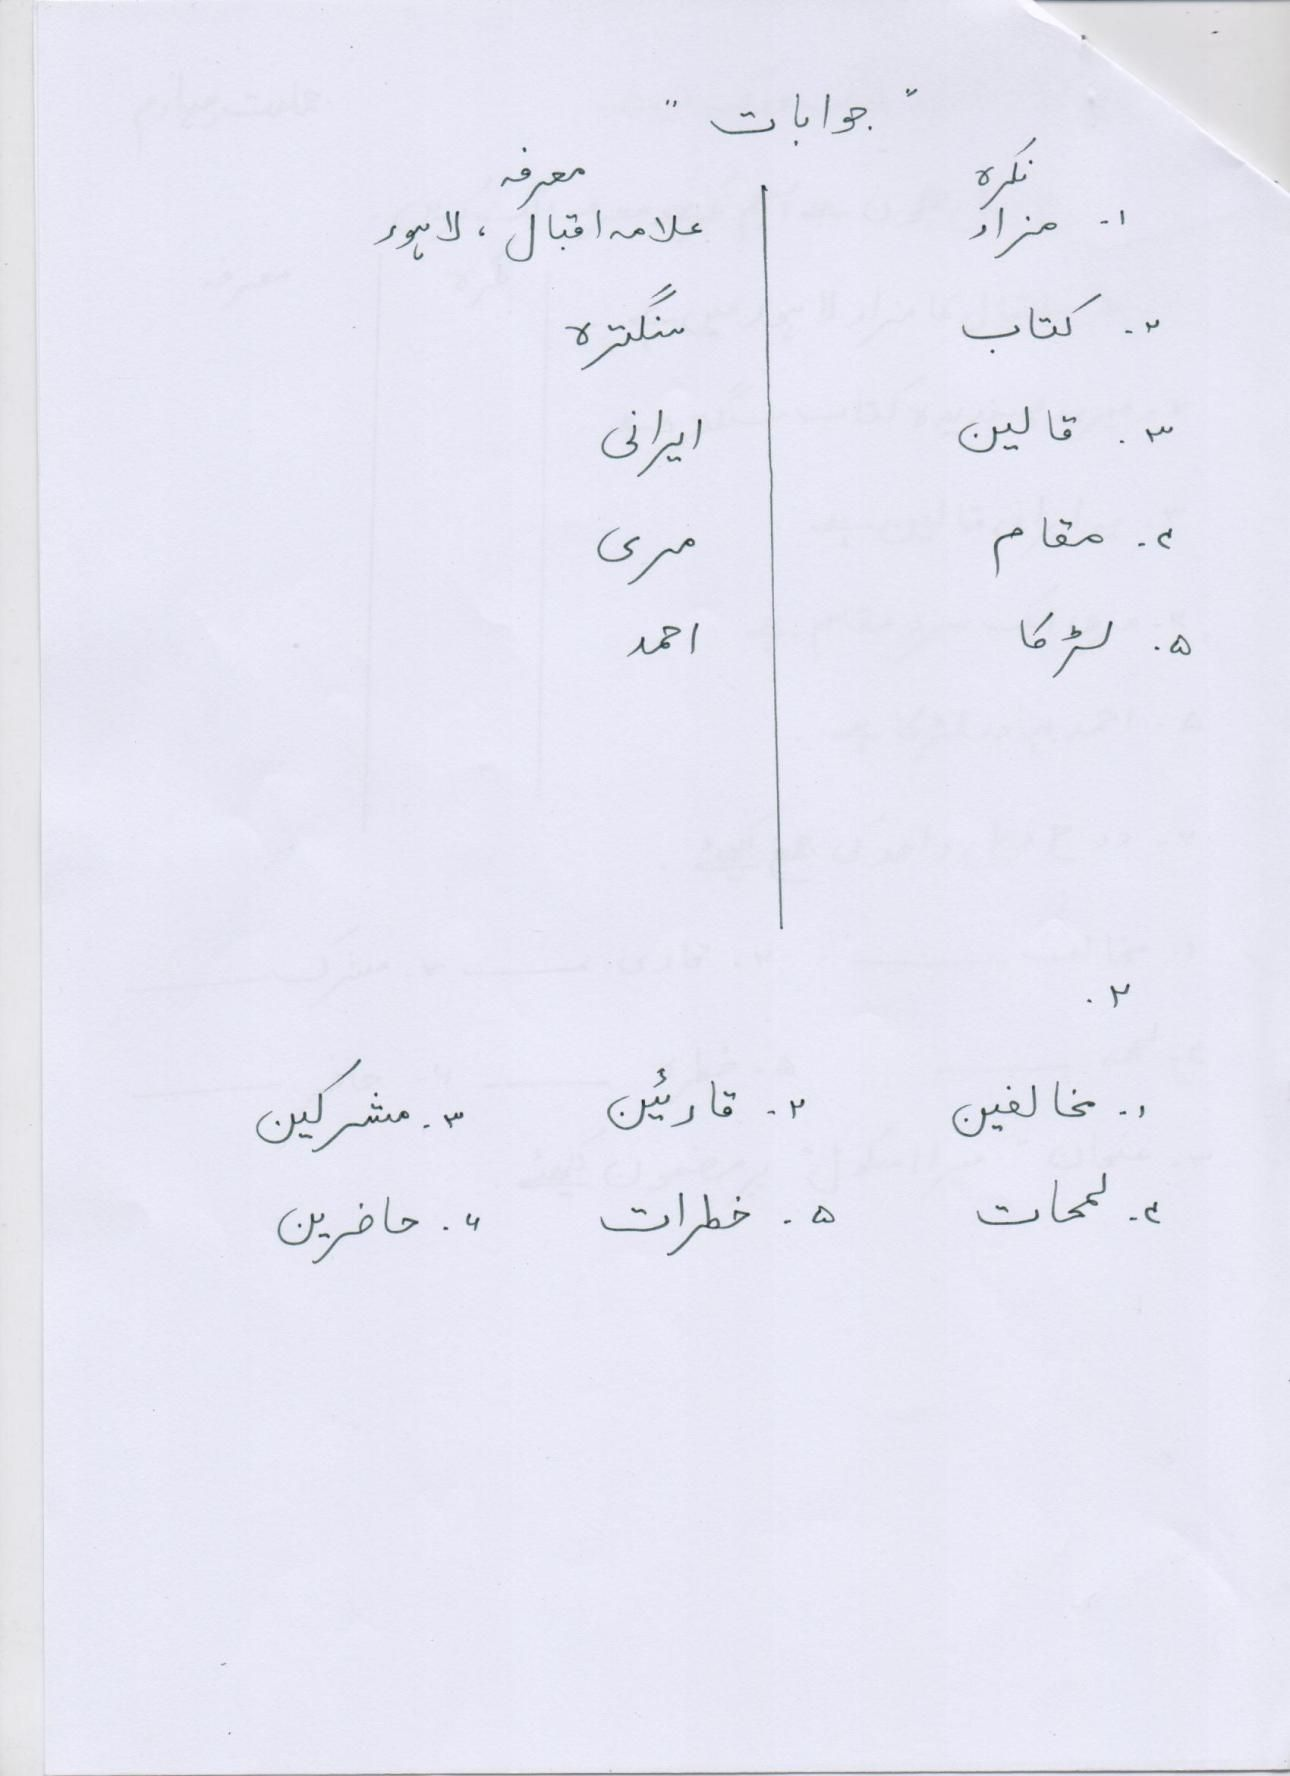 hight resolution of Urdu Worksheet For Class 4 Karachi   Printable Worksheets and Activities  for Teachers